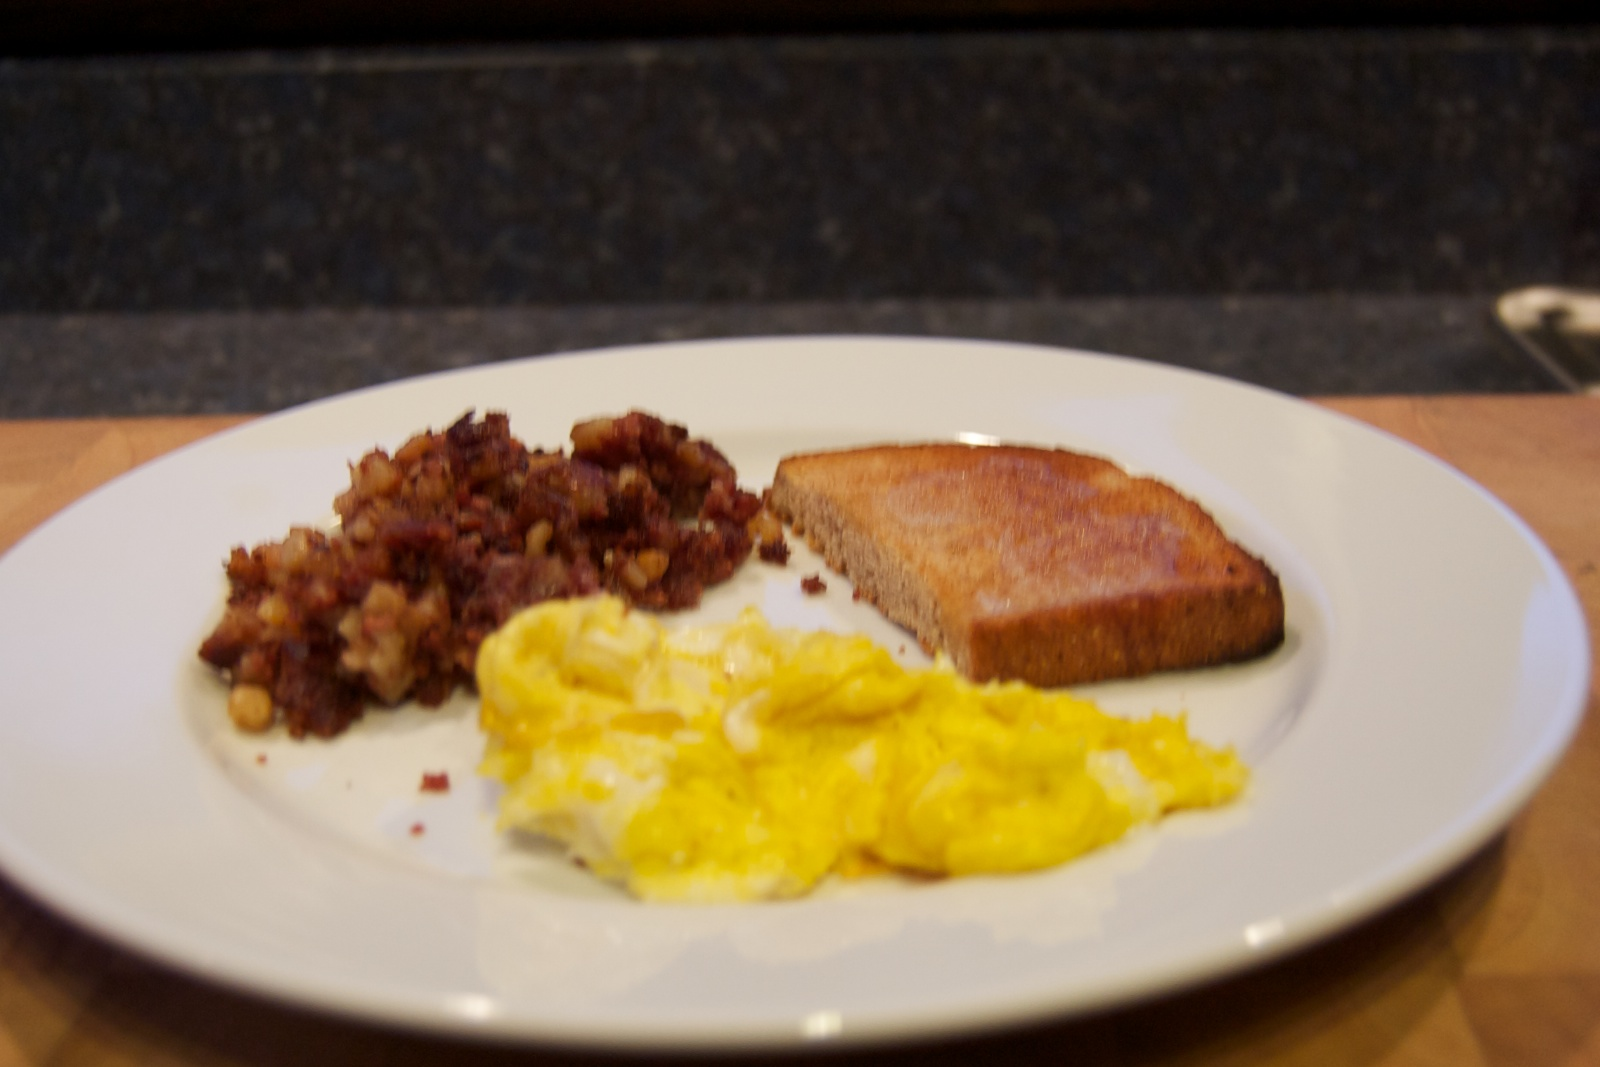 http://blog.rickk.com/food/2012/03/16/ate.2012.03.16.b.jpg